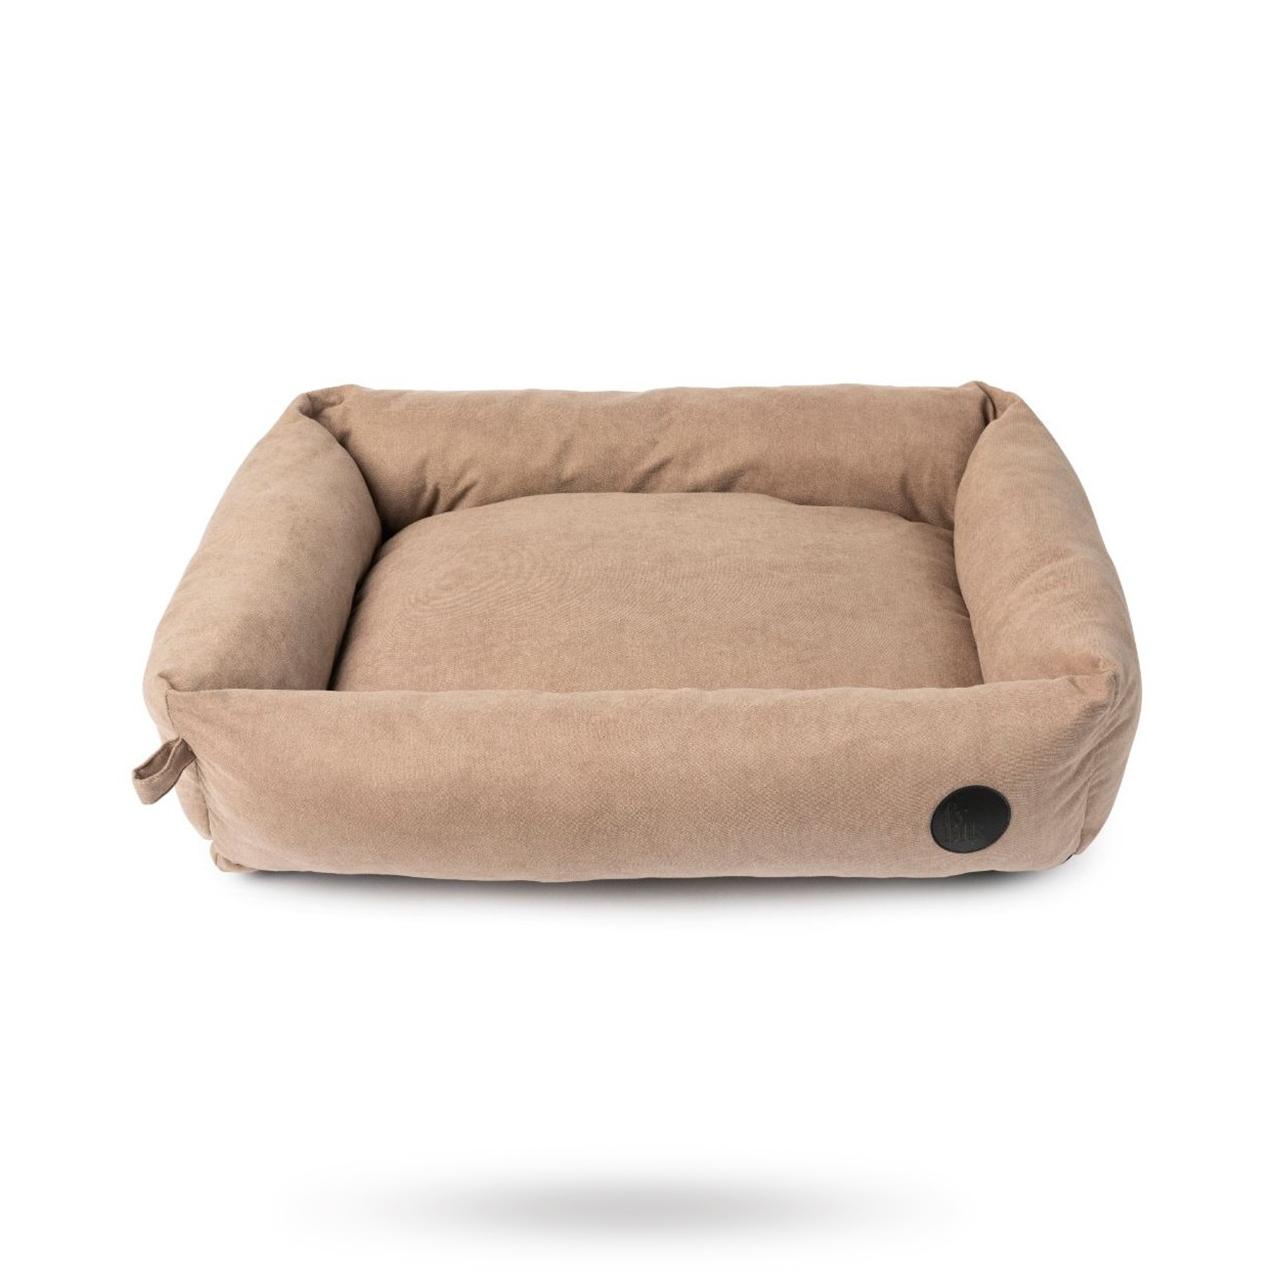 Lounge Bed Mocca - Hundbädd Small